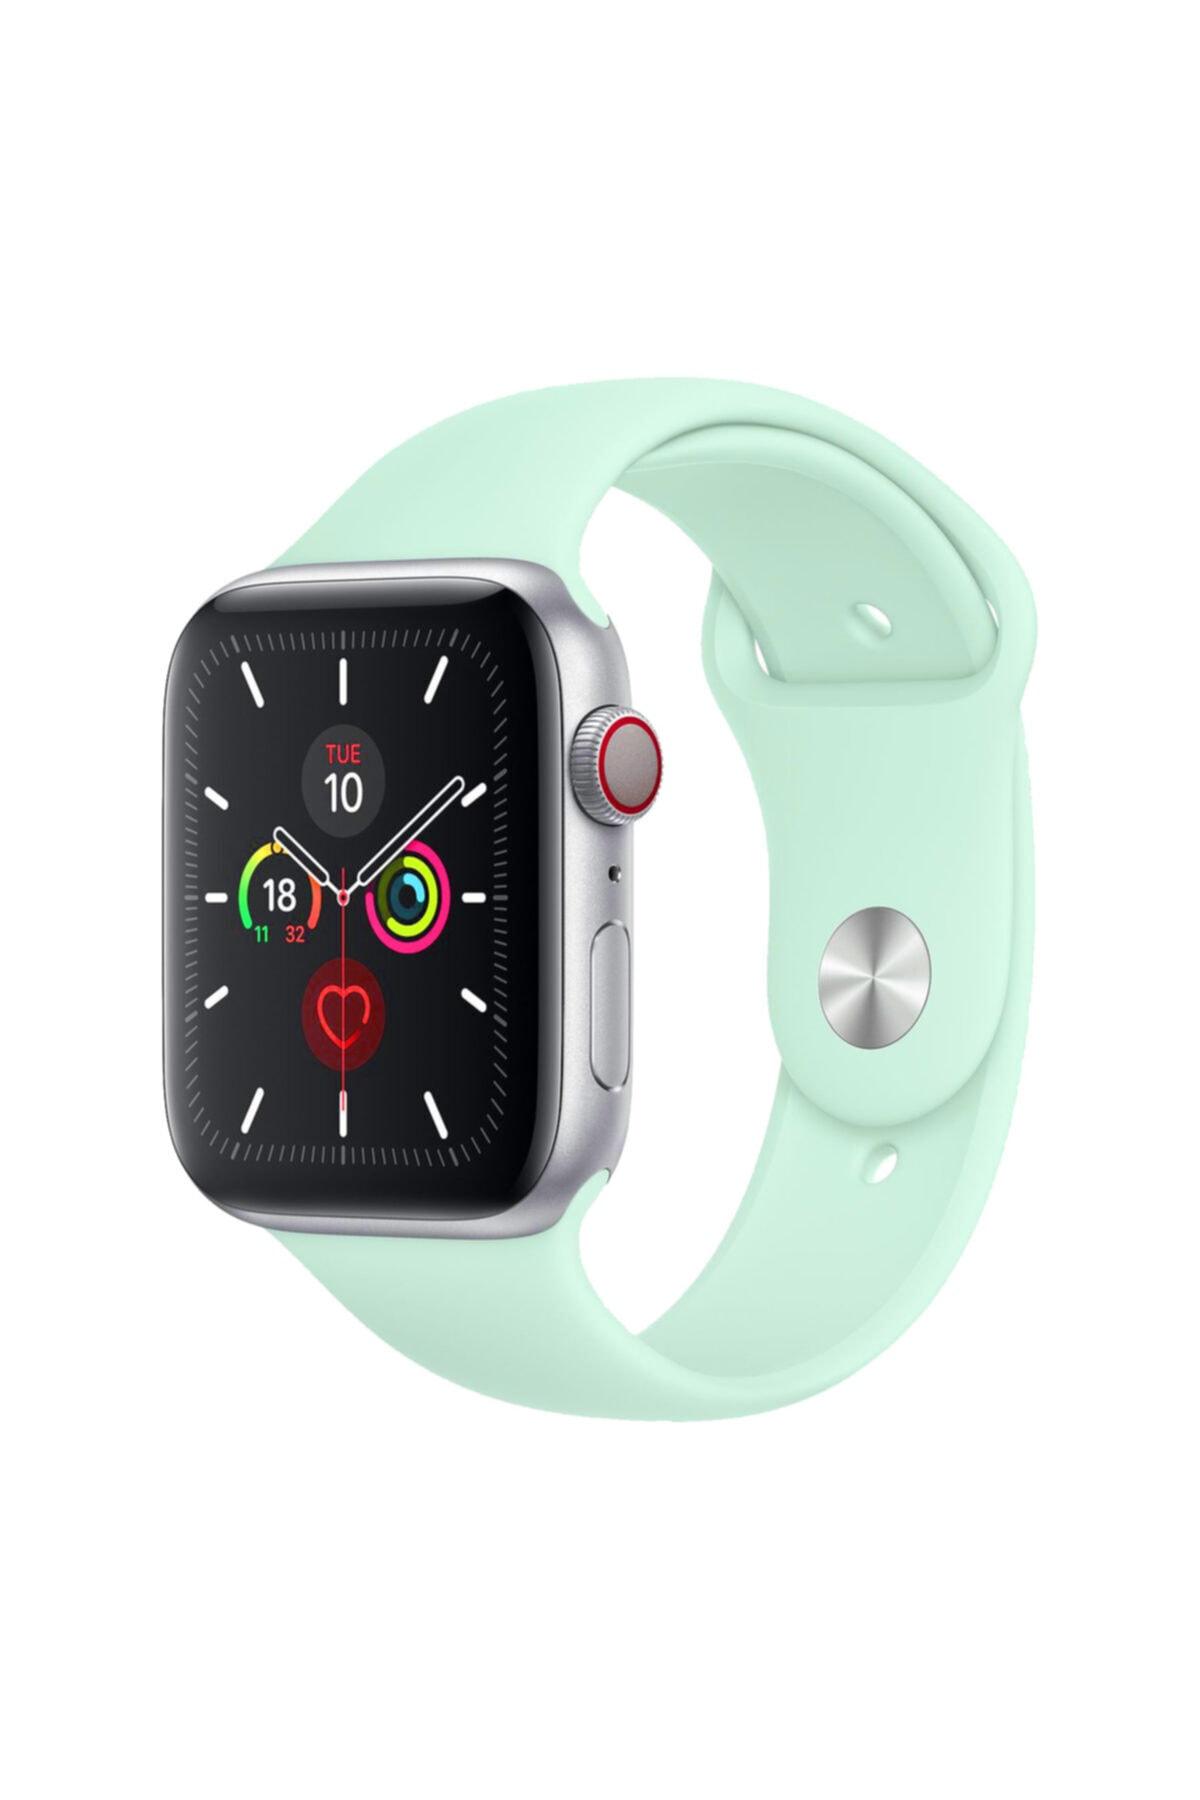 Apple Watch Kordon 2 3 4 5 6 Se Seri 38 Mm Ve 40 Mm Uyumlu Silikon Kordon Kayış - Marina Yeşili